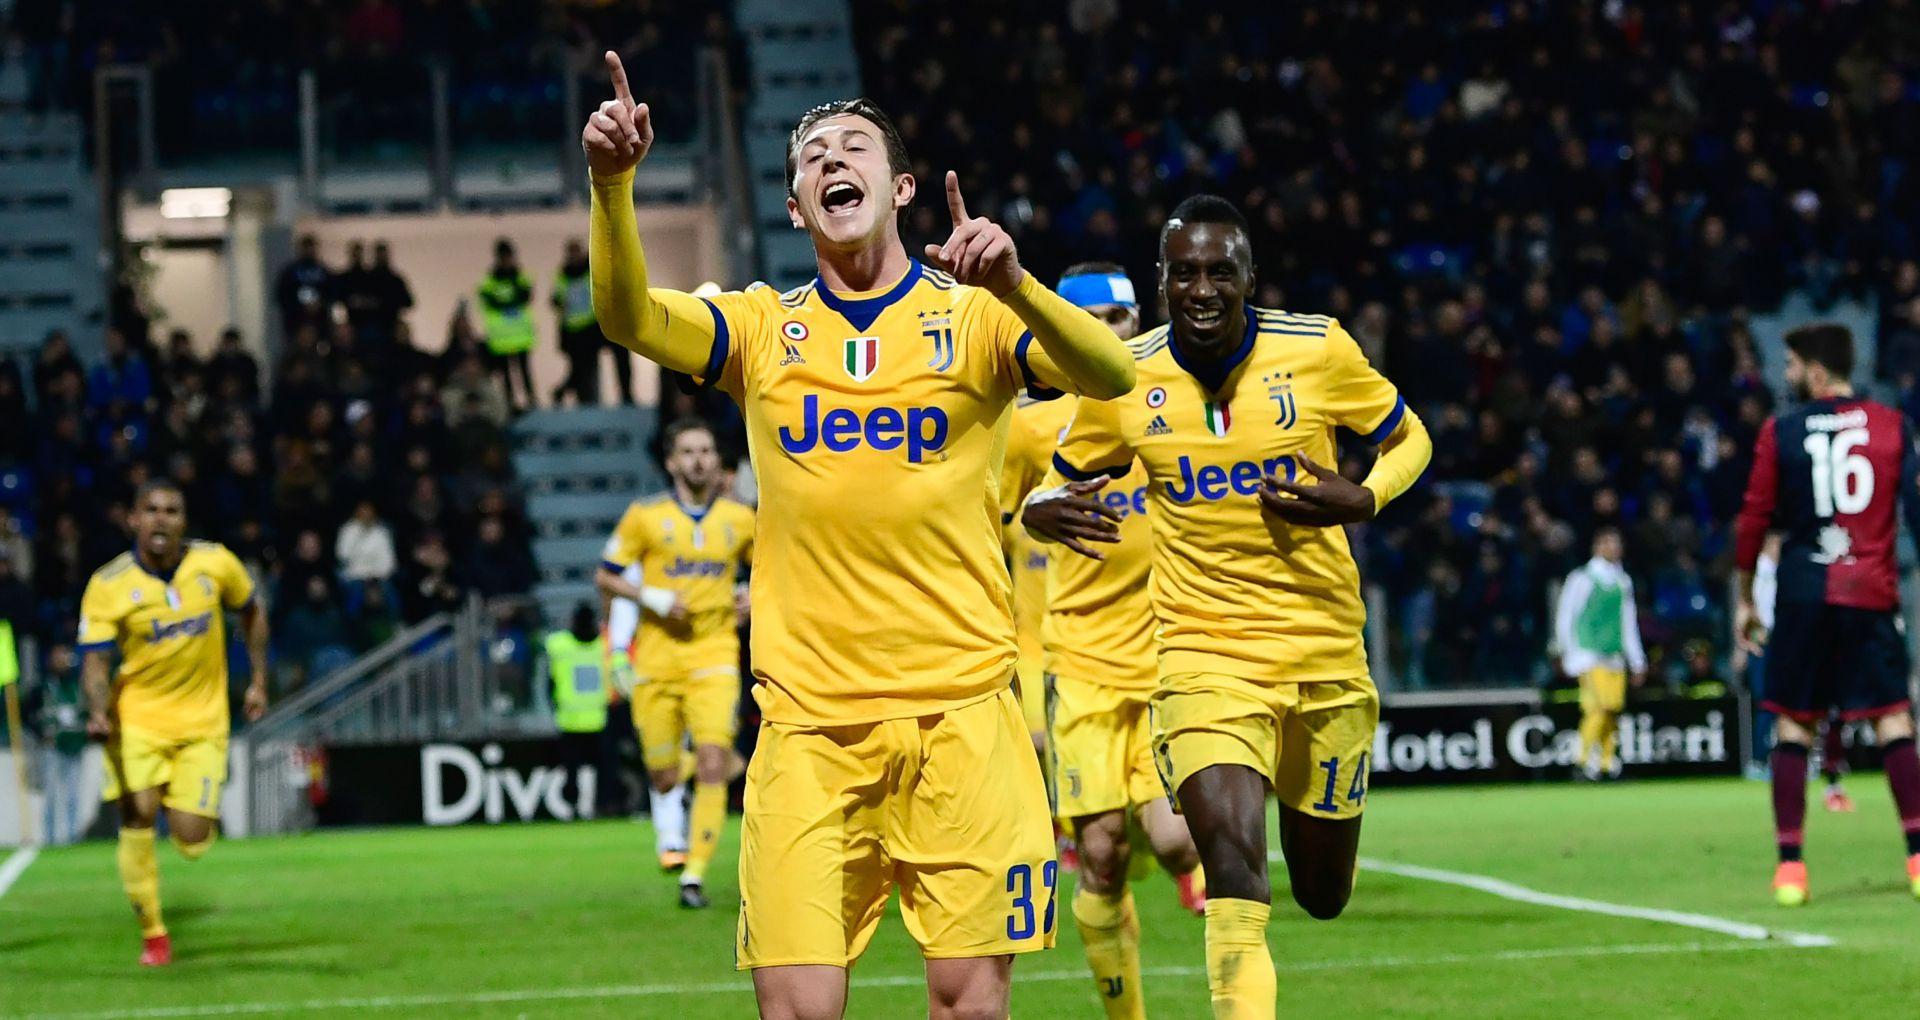 How to Watch Juventus vs. Genoa